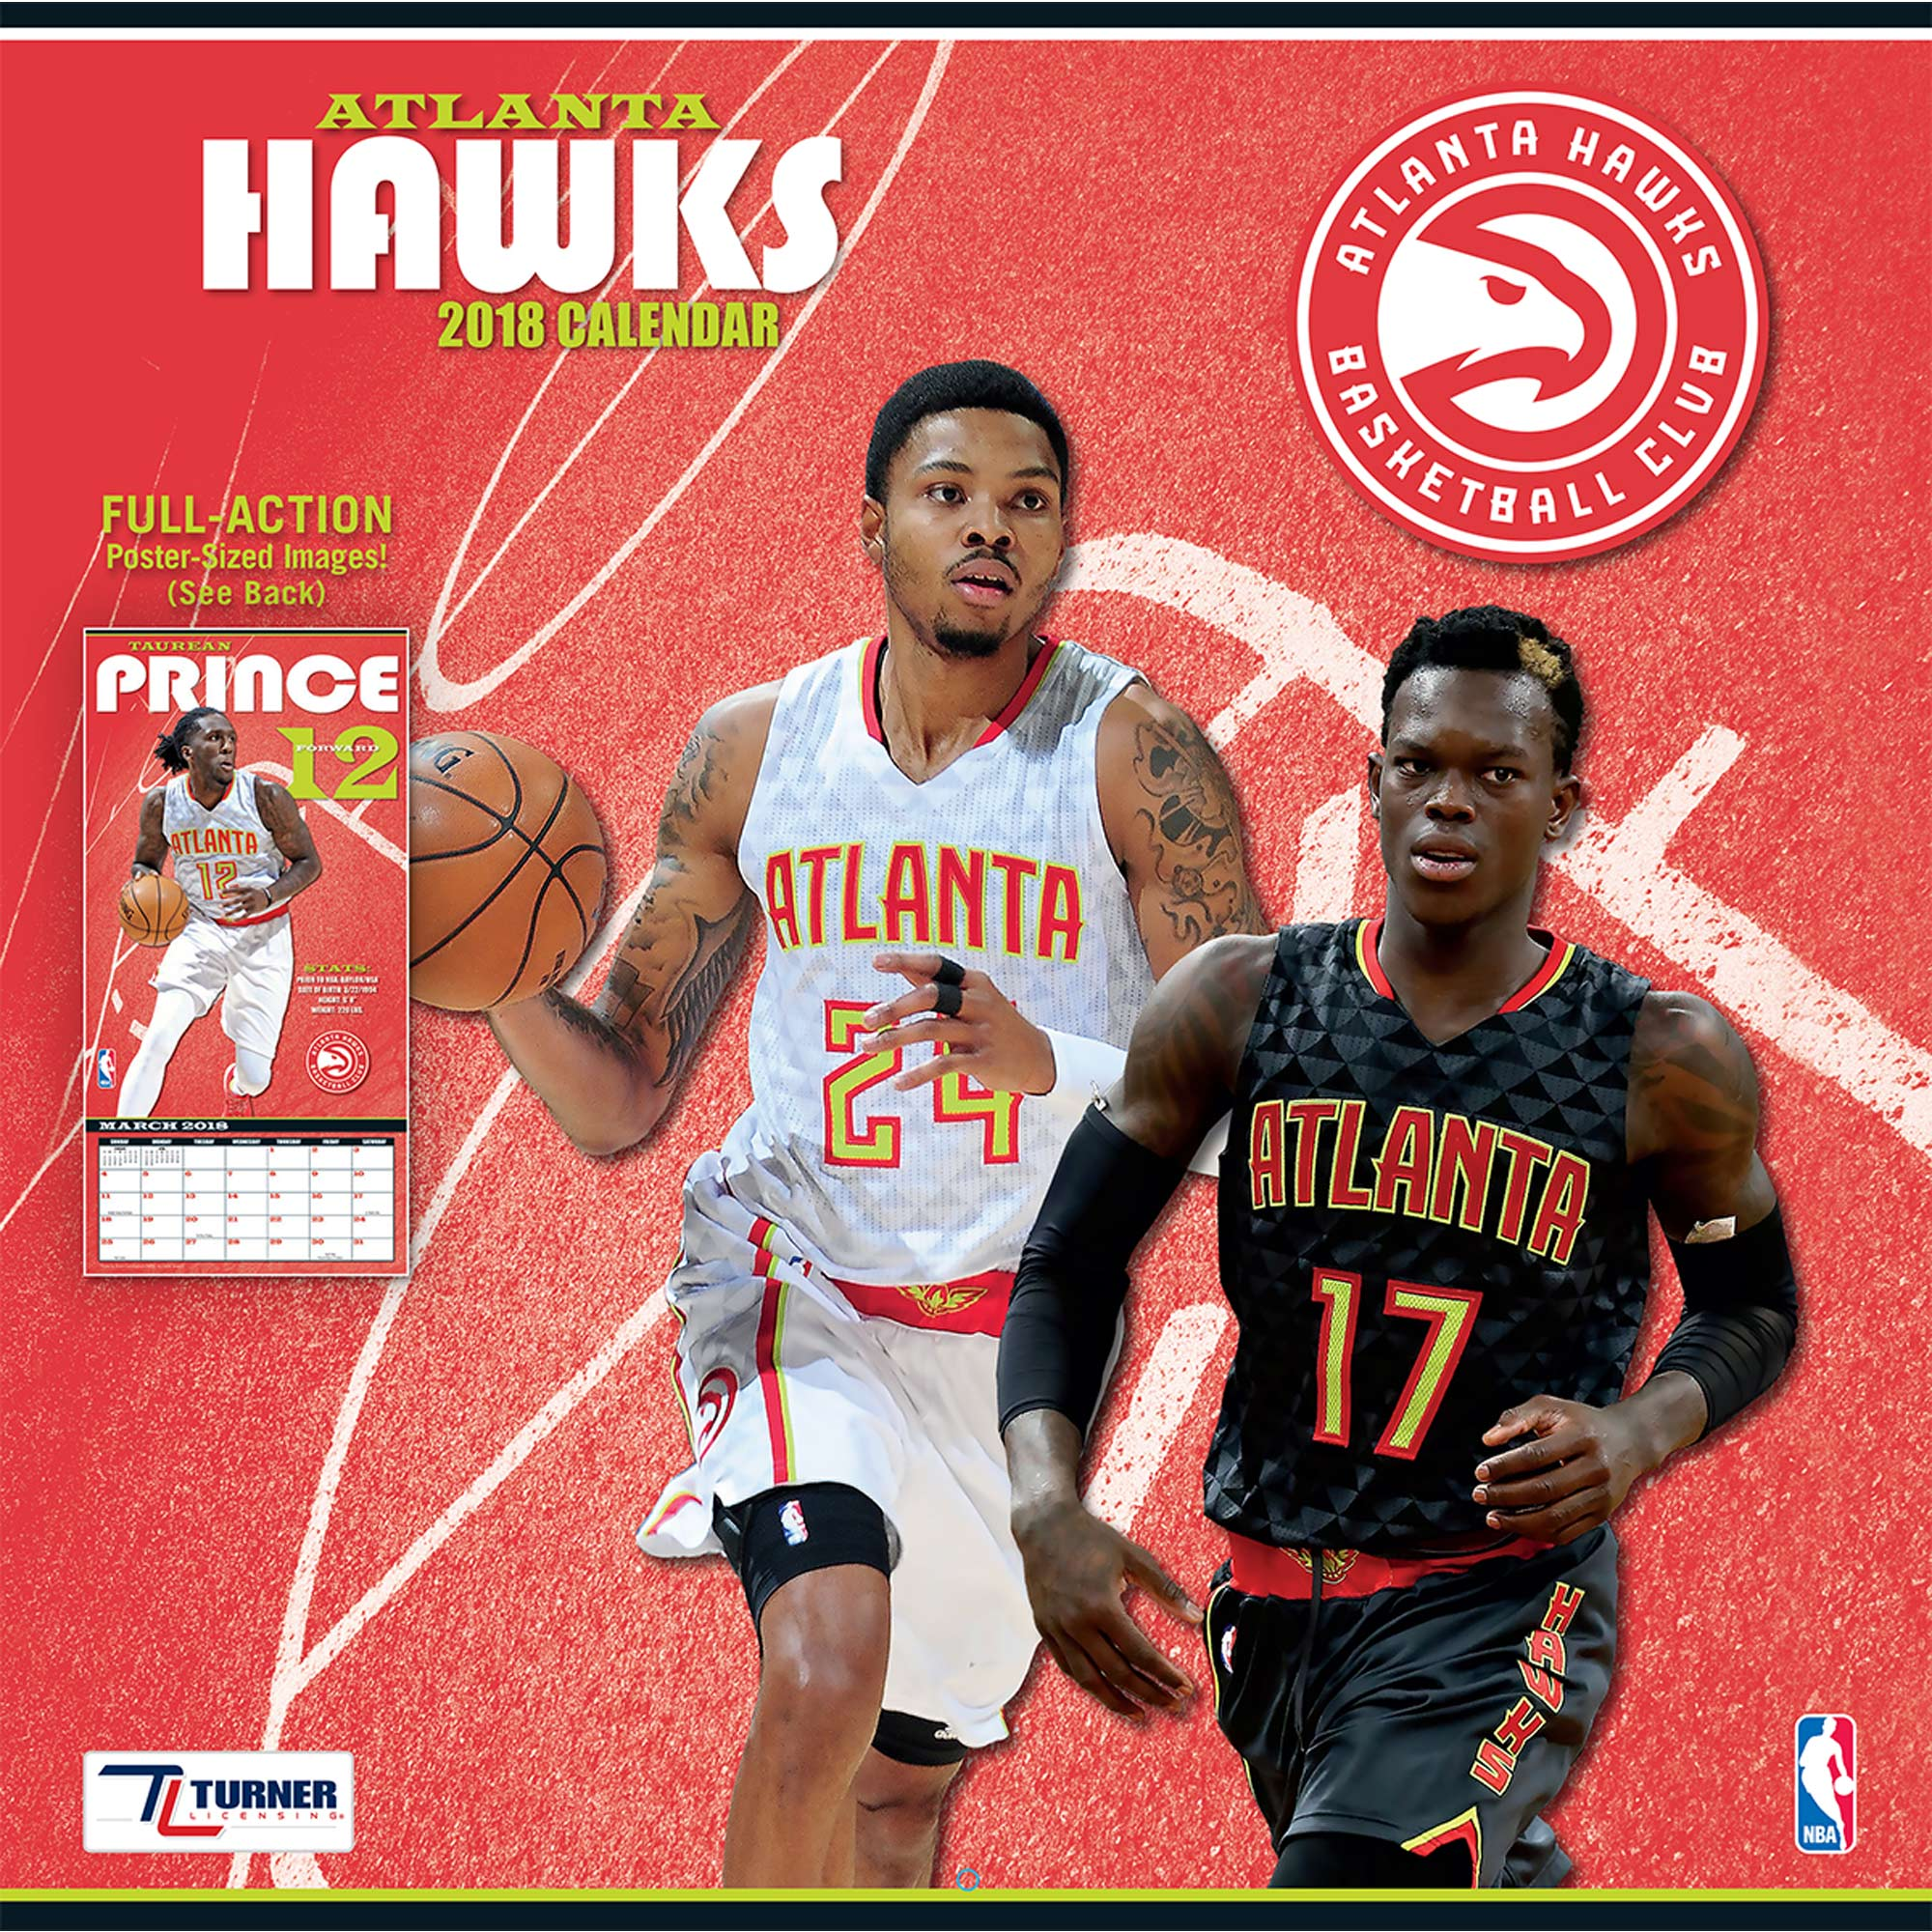 "Atlanta Hawks 2018 12"" x 12"" Team Wall Calendar"